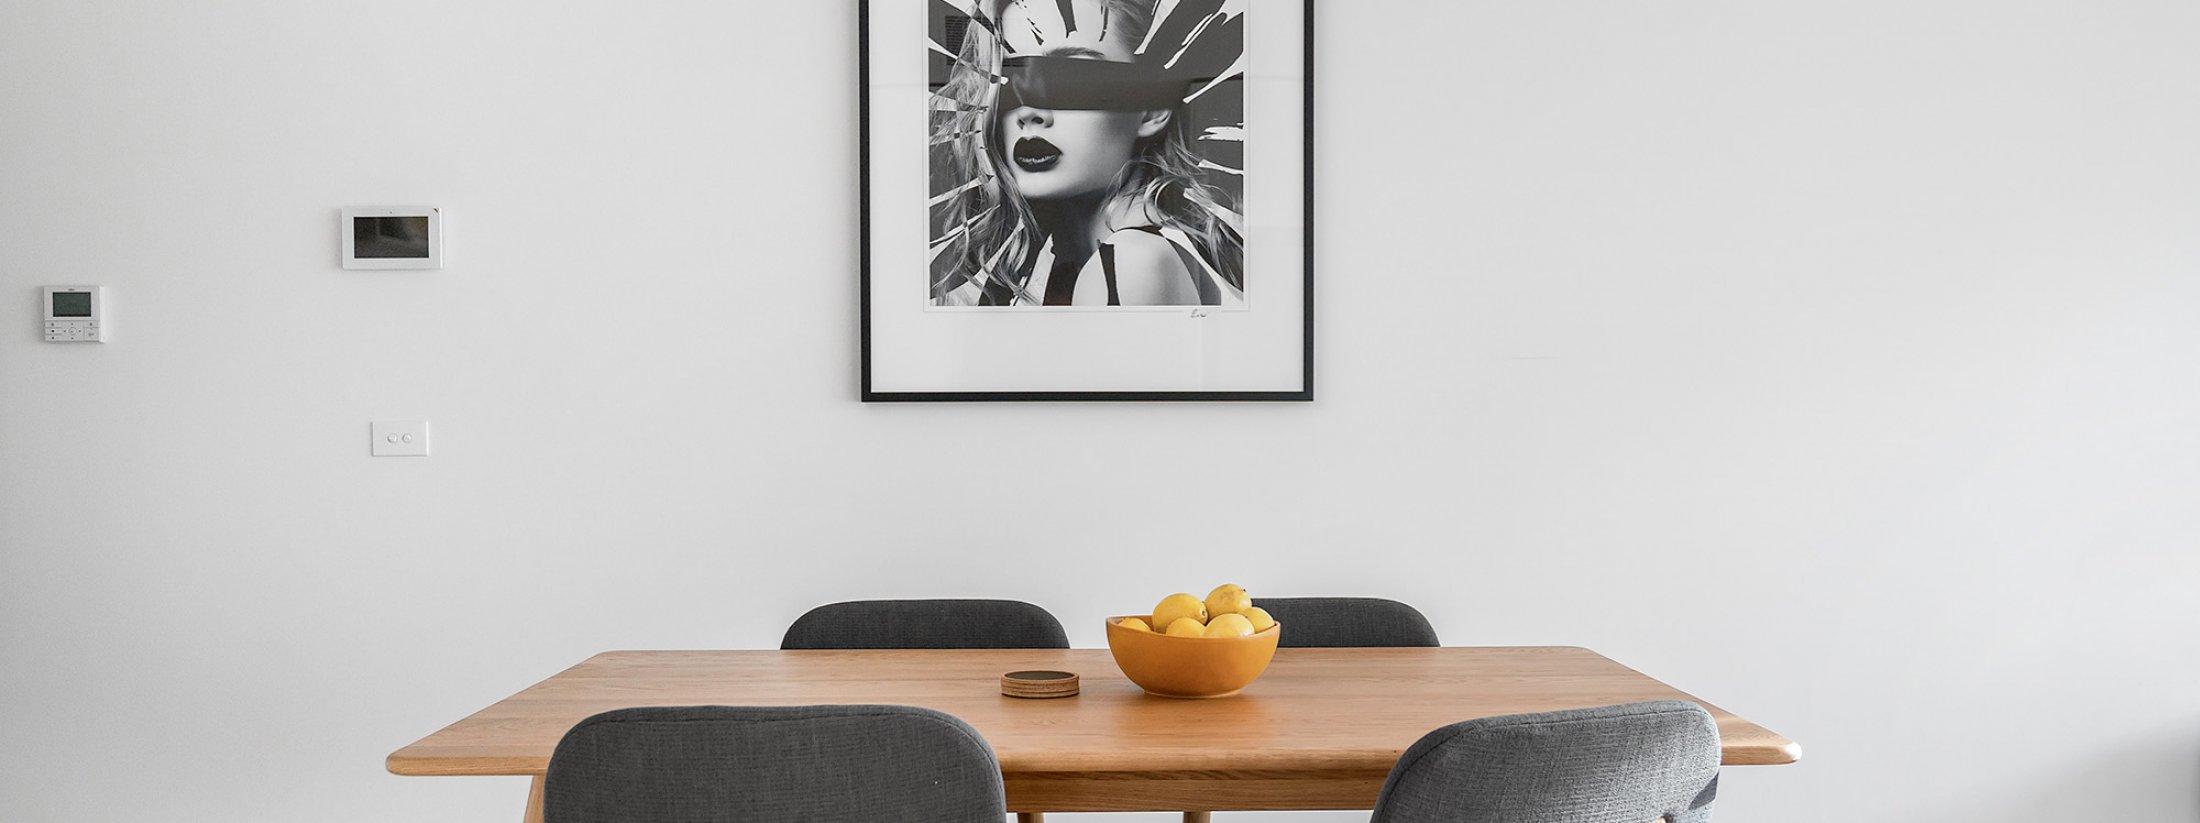 Axel Apartments - The Clarke - Glen Iris - Dining